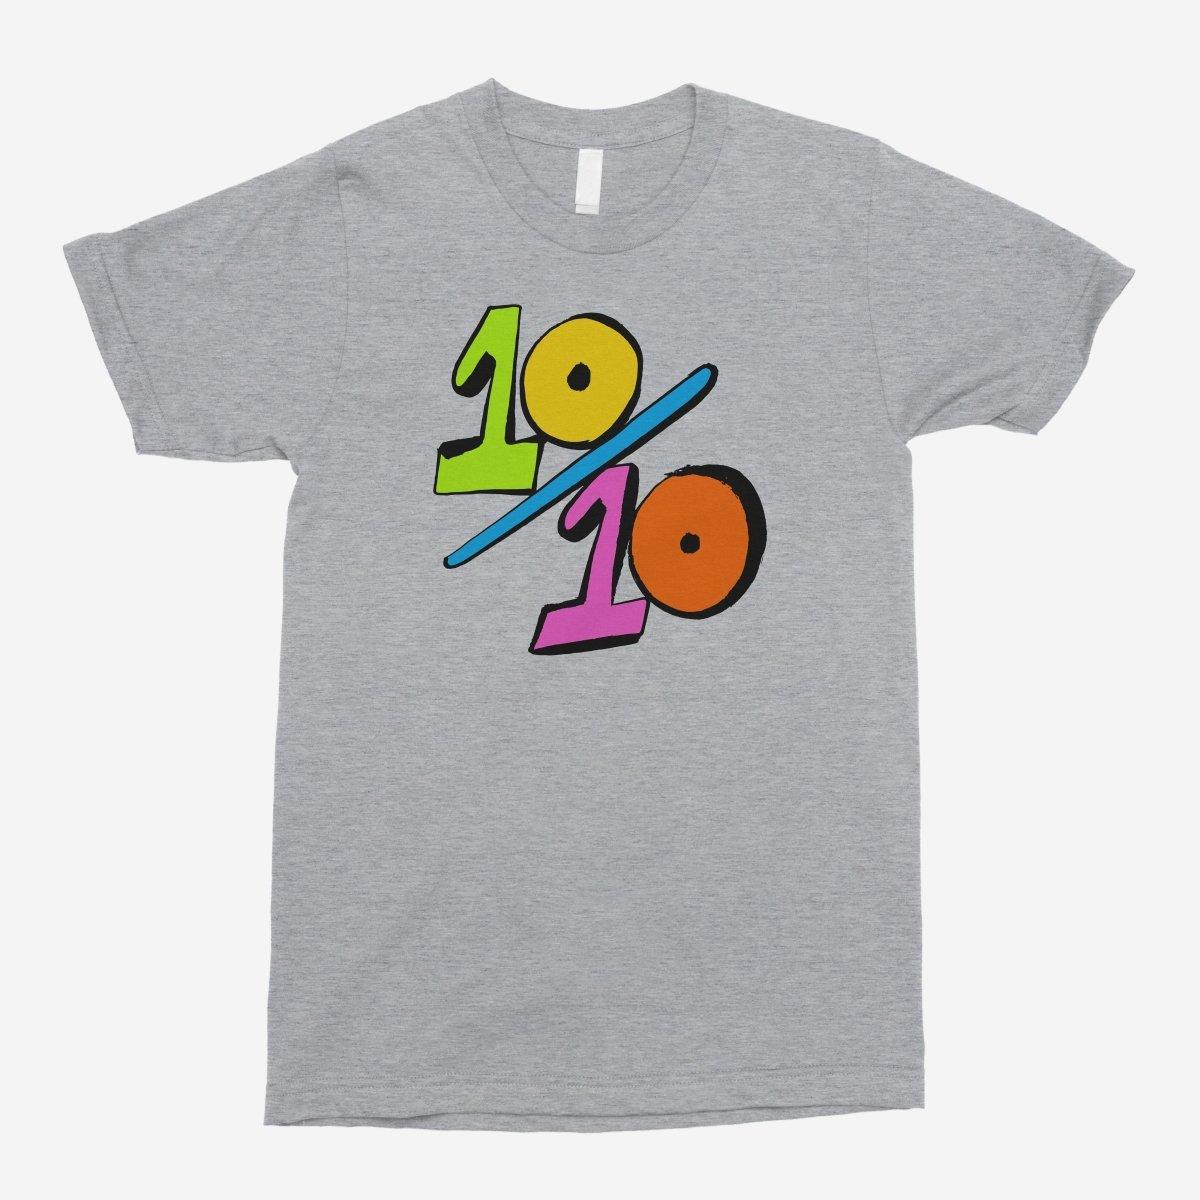 Rex Orange County - 10/10 Unisex T-Shirt